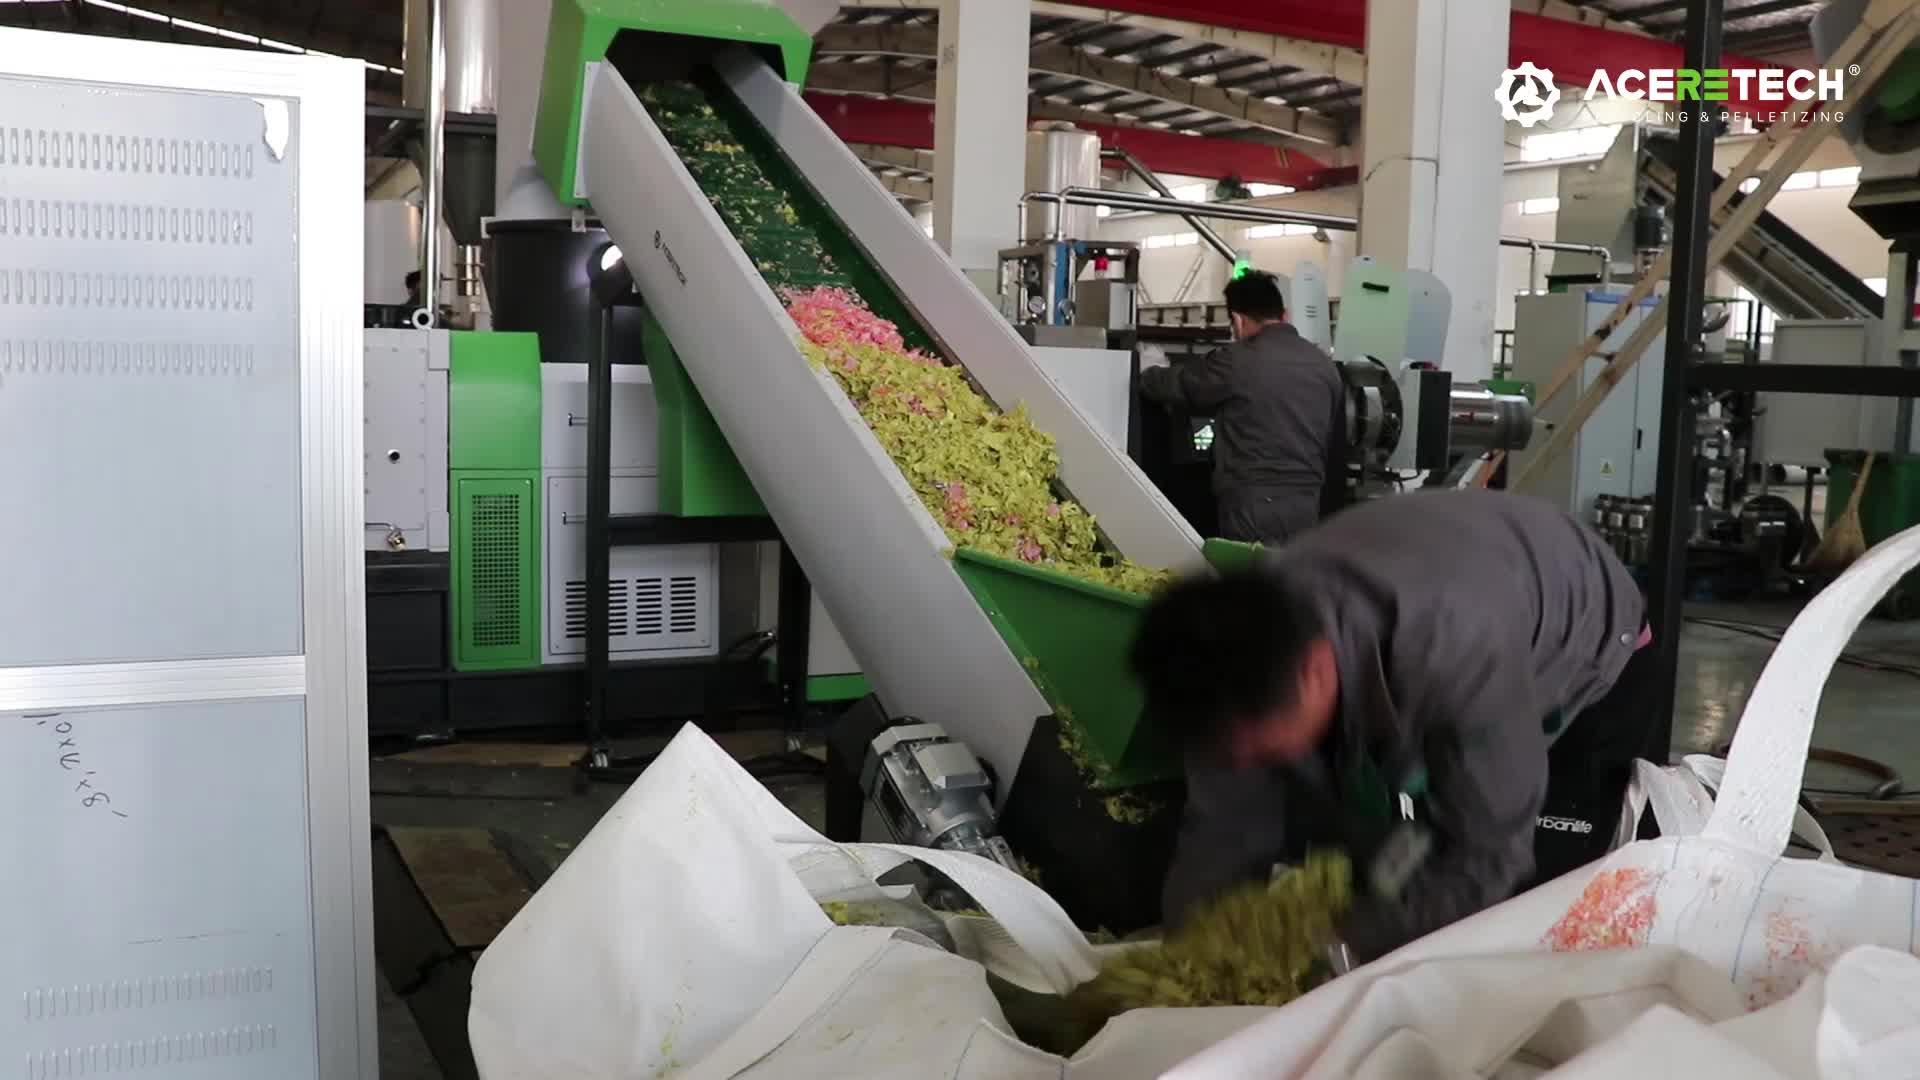 Recycling Machine Voor Huisdier Pp Hdpe Ldpe Lldpe Abs Pvc Pe Film Jumbo Geweven Zakken Vuilnis Fles Vlok Drum Pallet lump Pijp